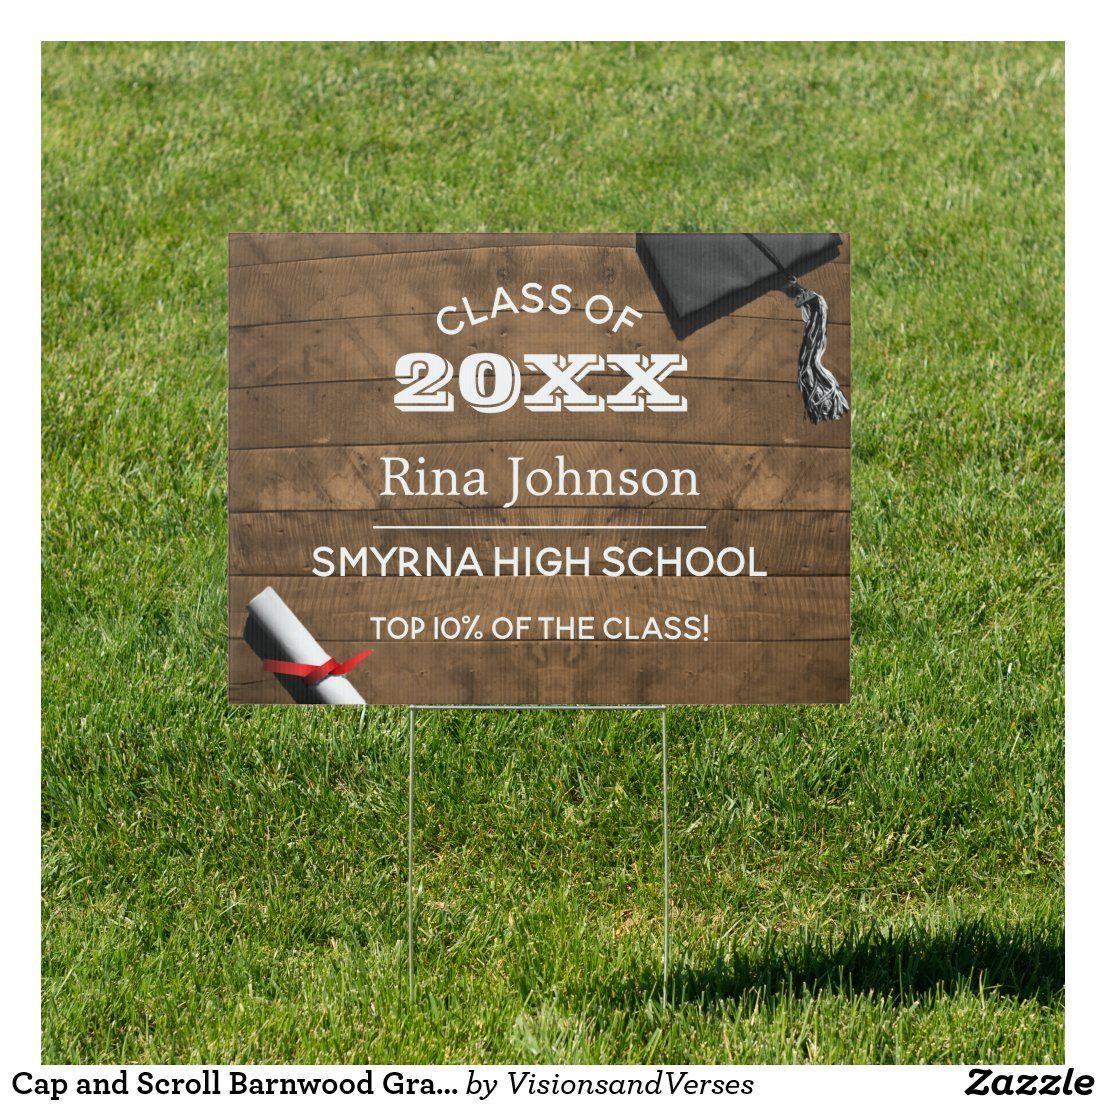 Cap and scroll barnwood graduation yard sign in 2020